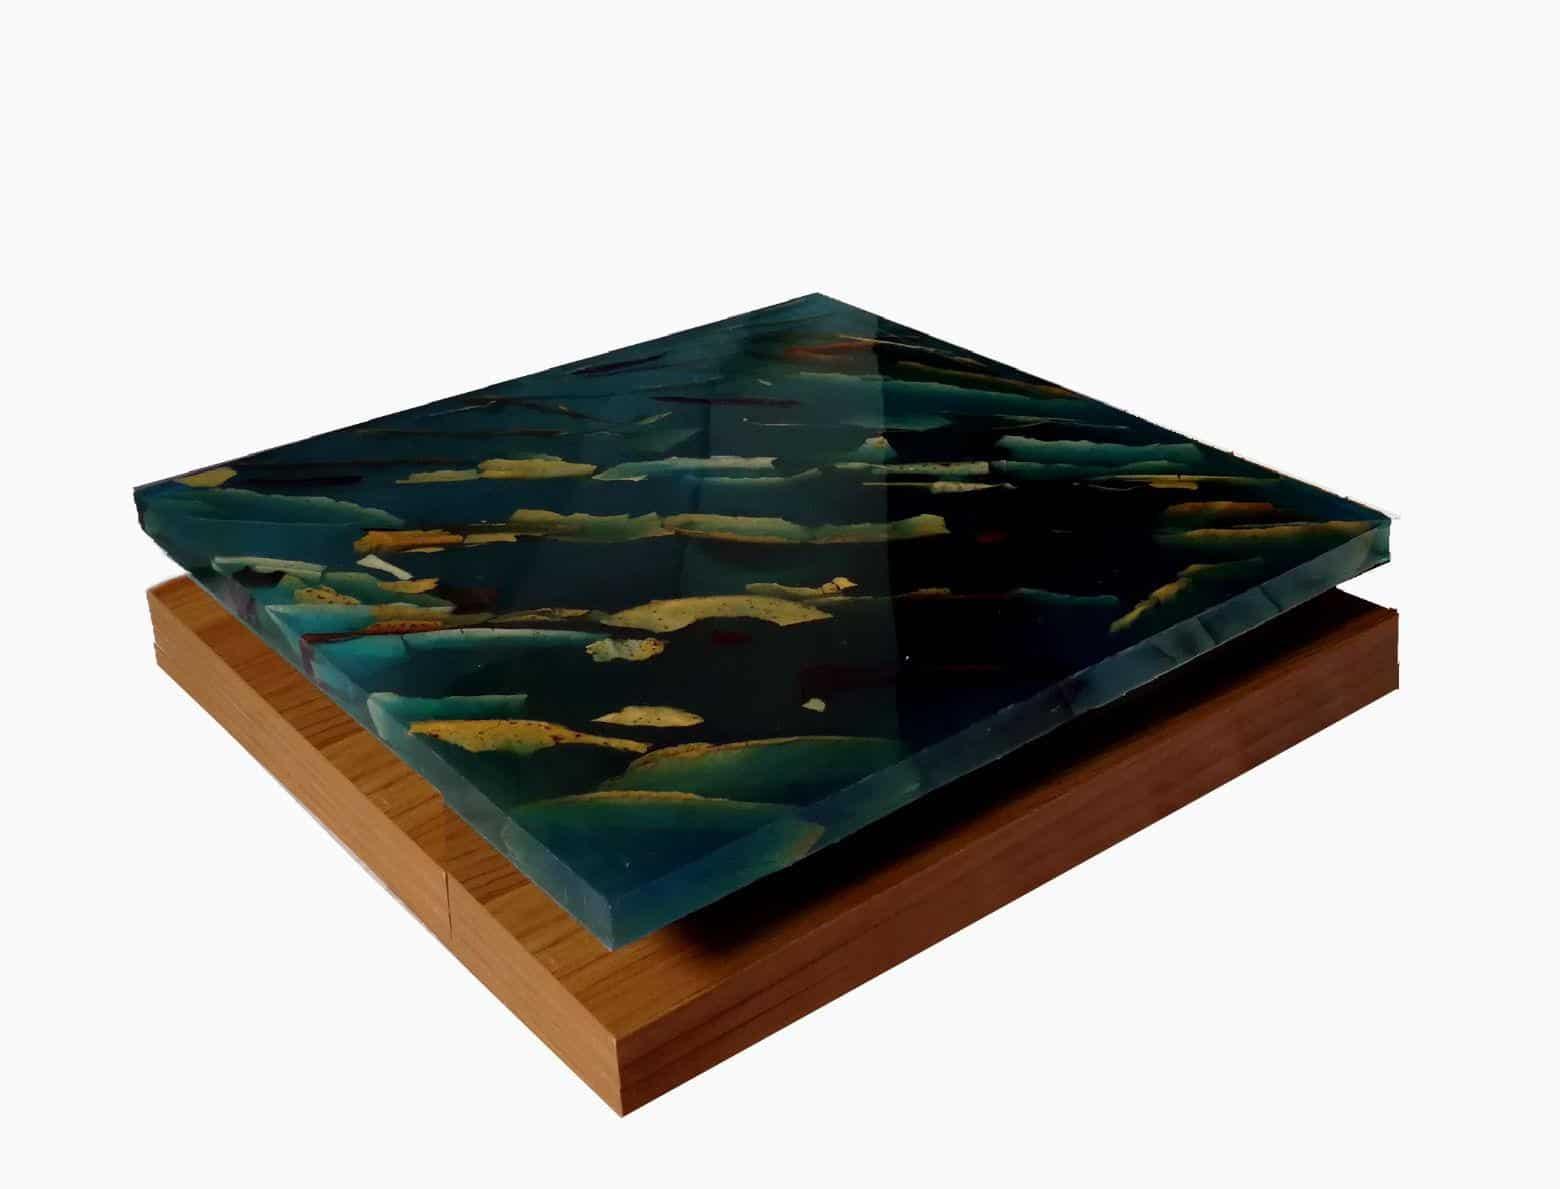 alessandro-lobino-a-the-nature-art-gallery